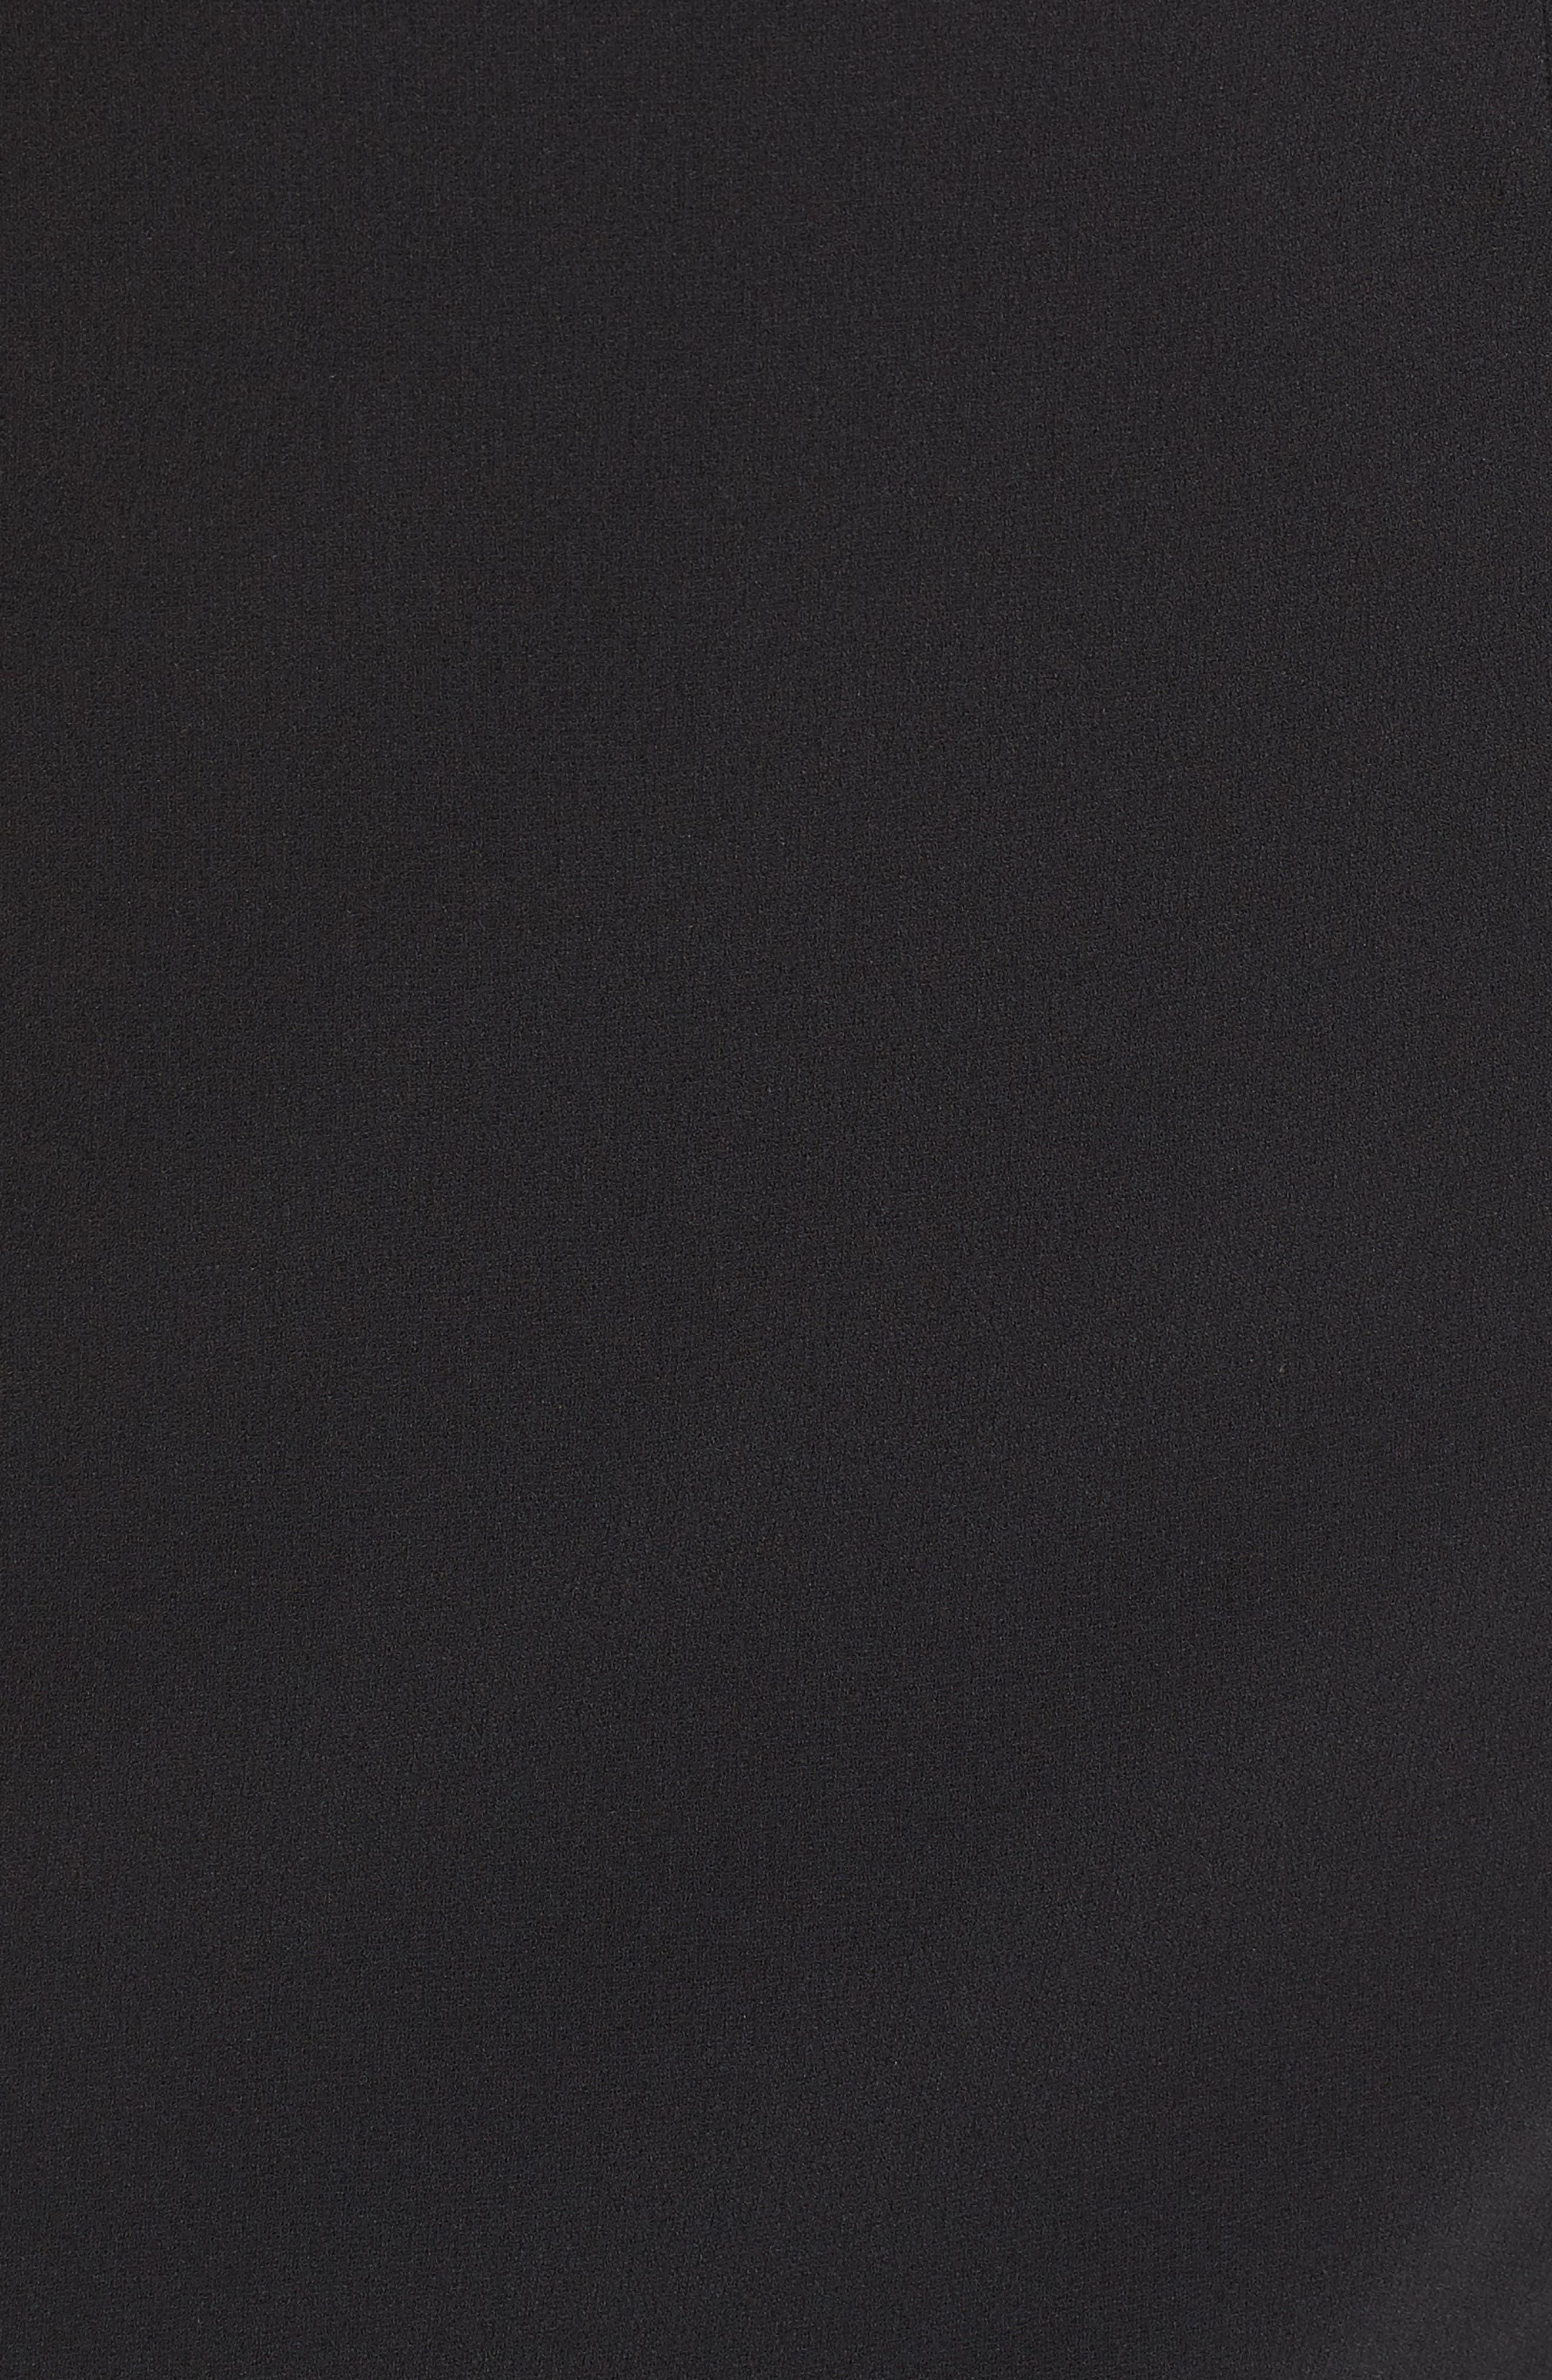 Cleo Halter Dress,                             Alternate thumbnail 10, color,                             BLACK/ BLACK